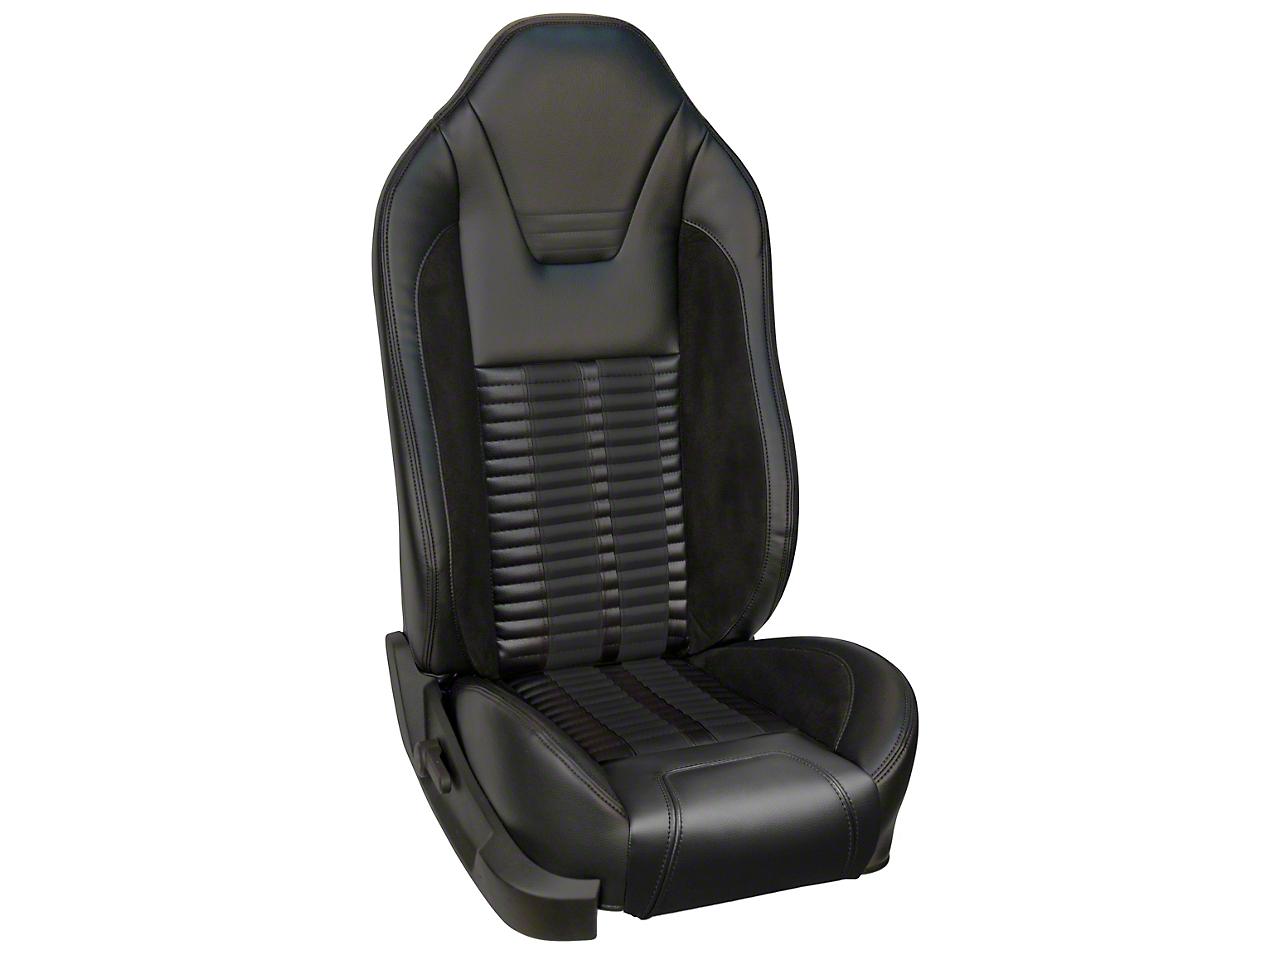 TMI Premium Sport R500 Upholstery & Foam Kit with Airbags - Black Vinyl & Black Stripe/Stitch (05-10 GT, V6)